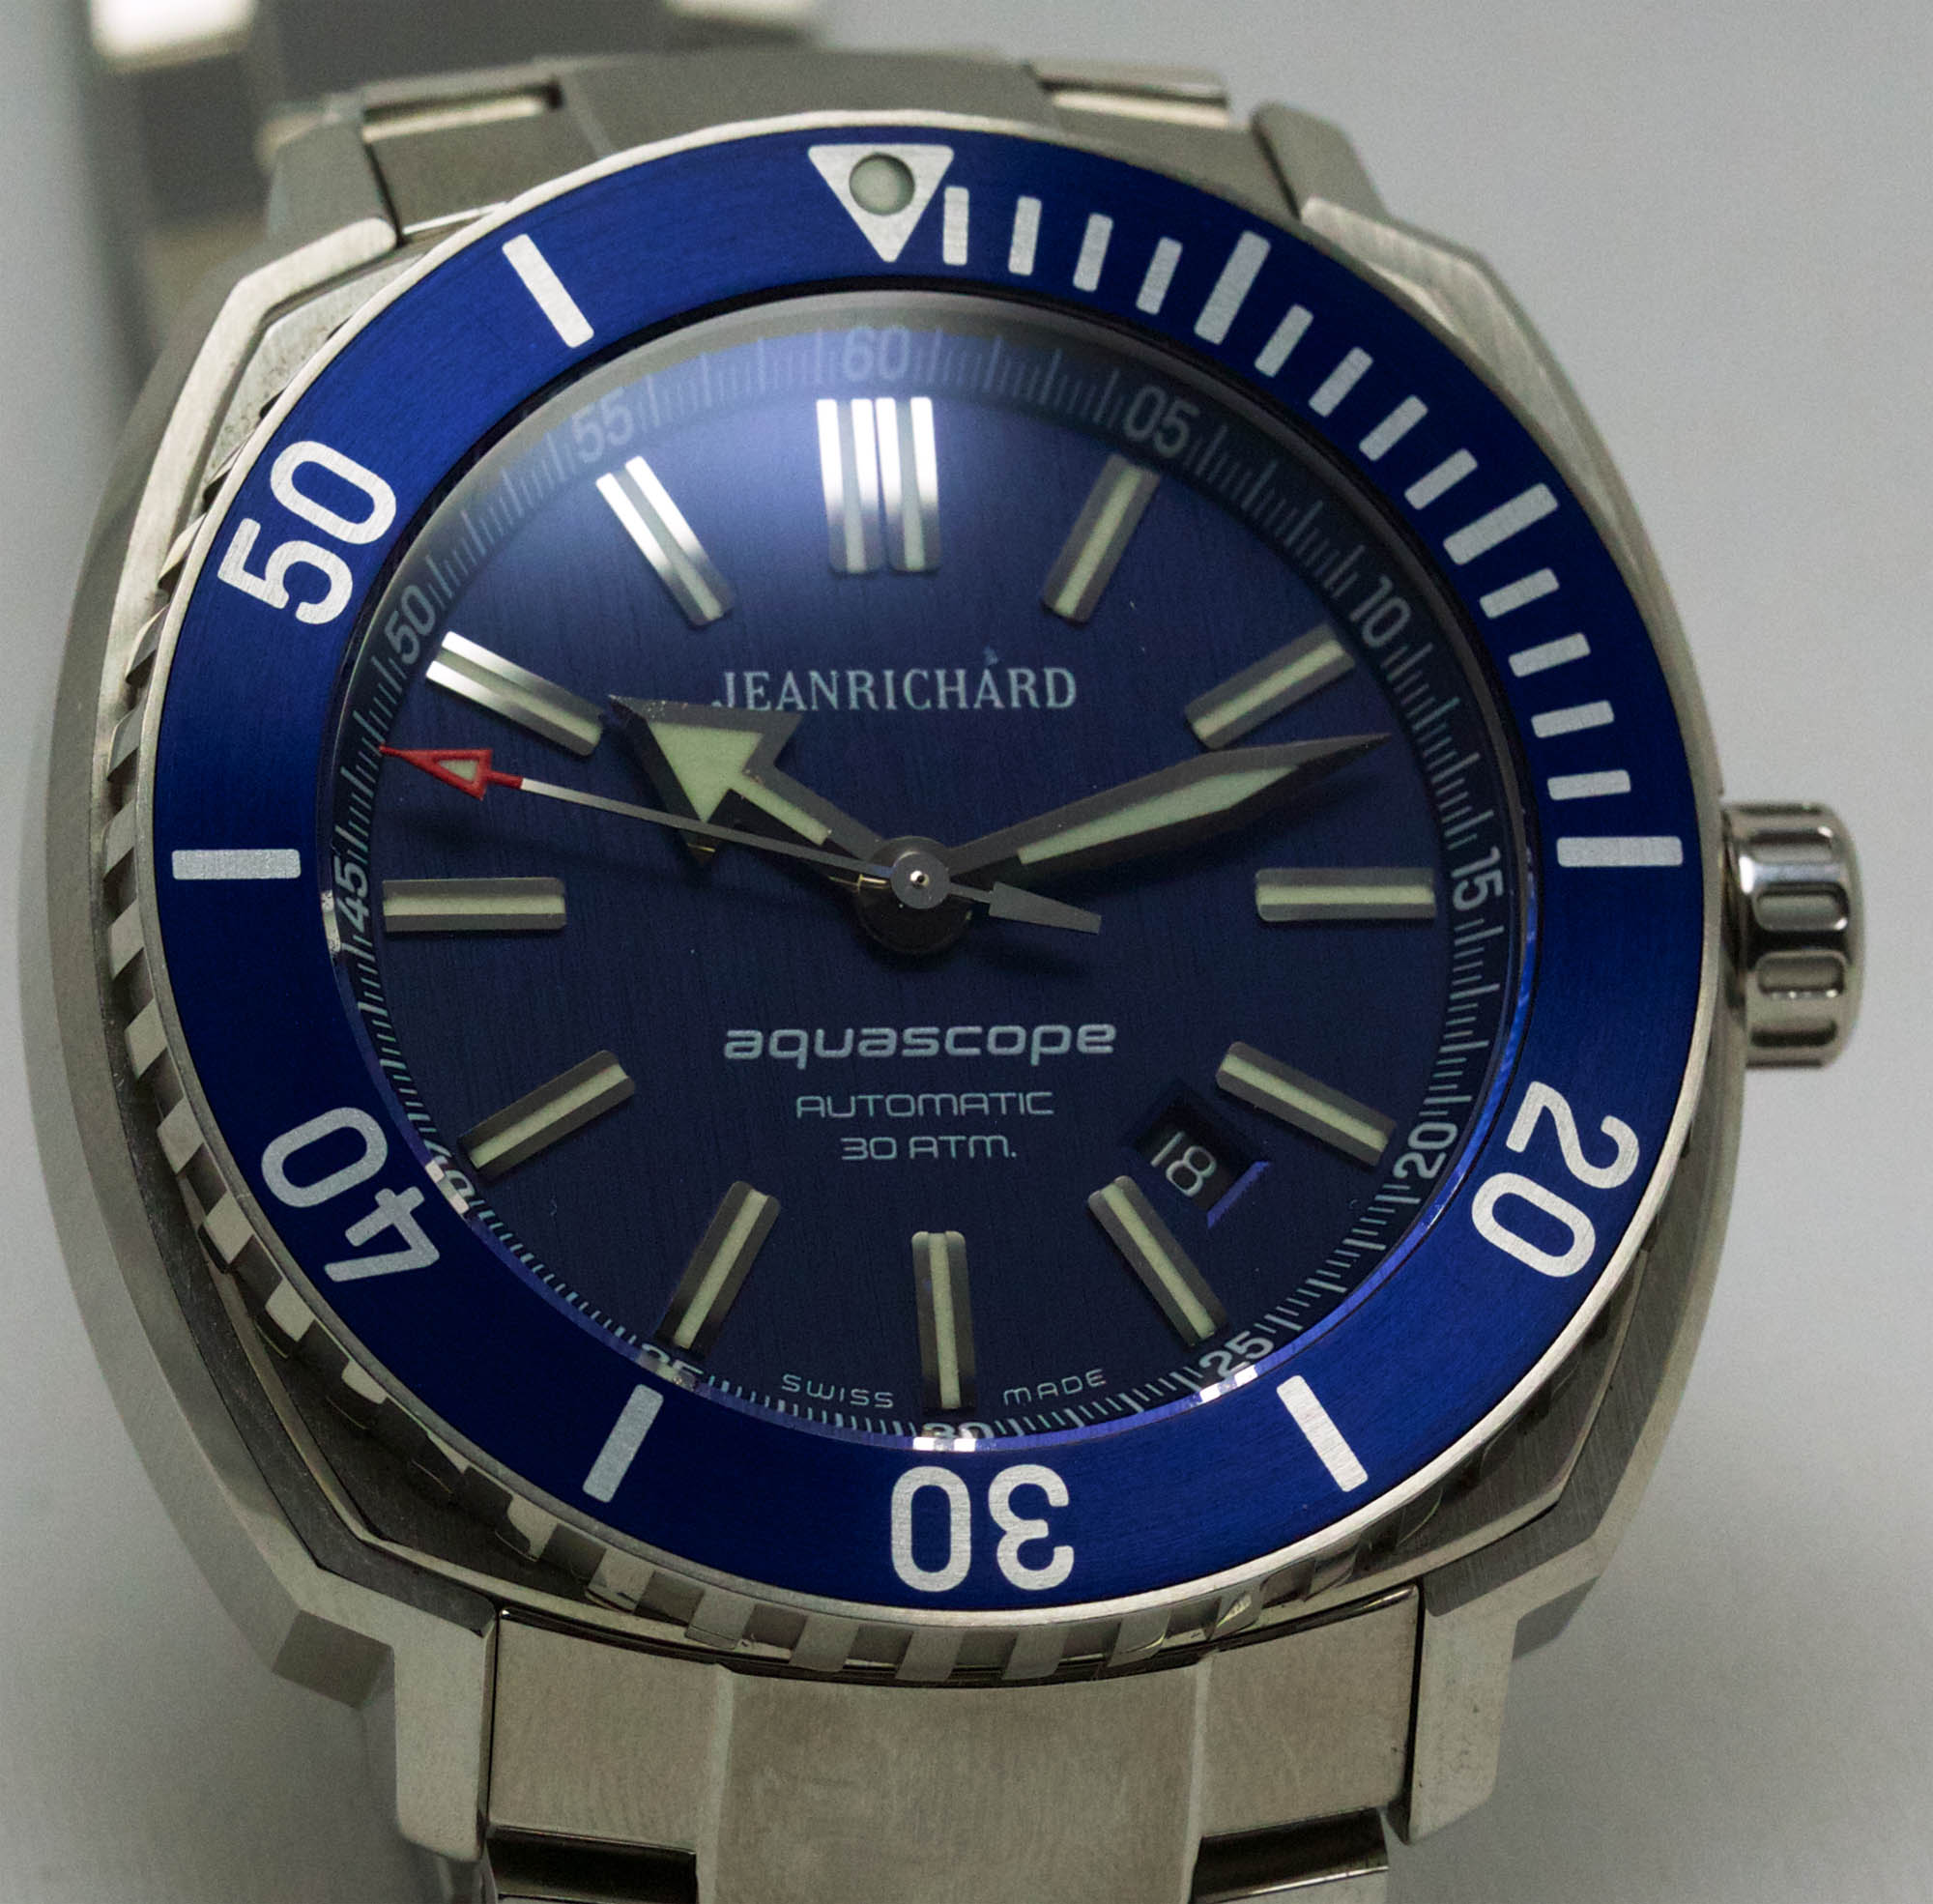 JeanRichard Aquascope Blue Dial - Dial